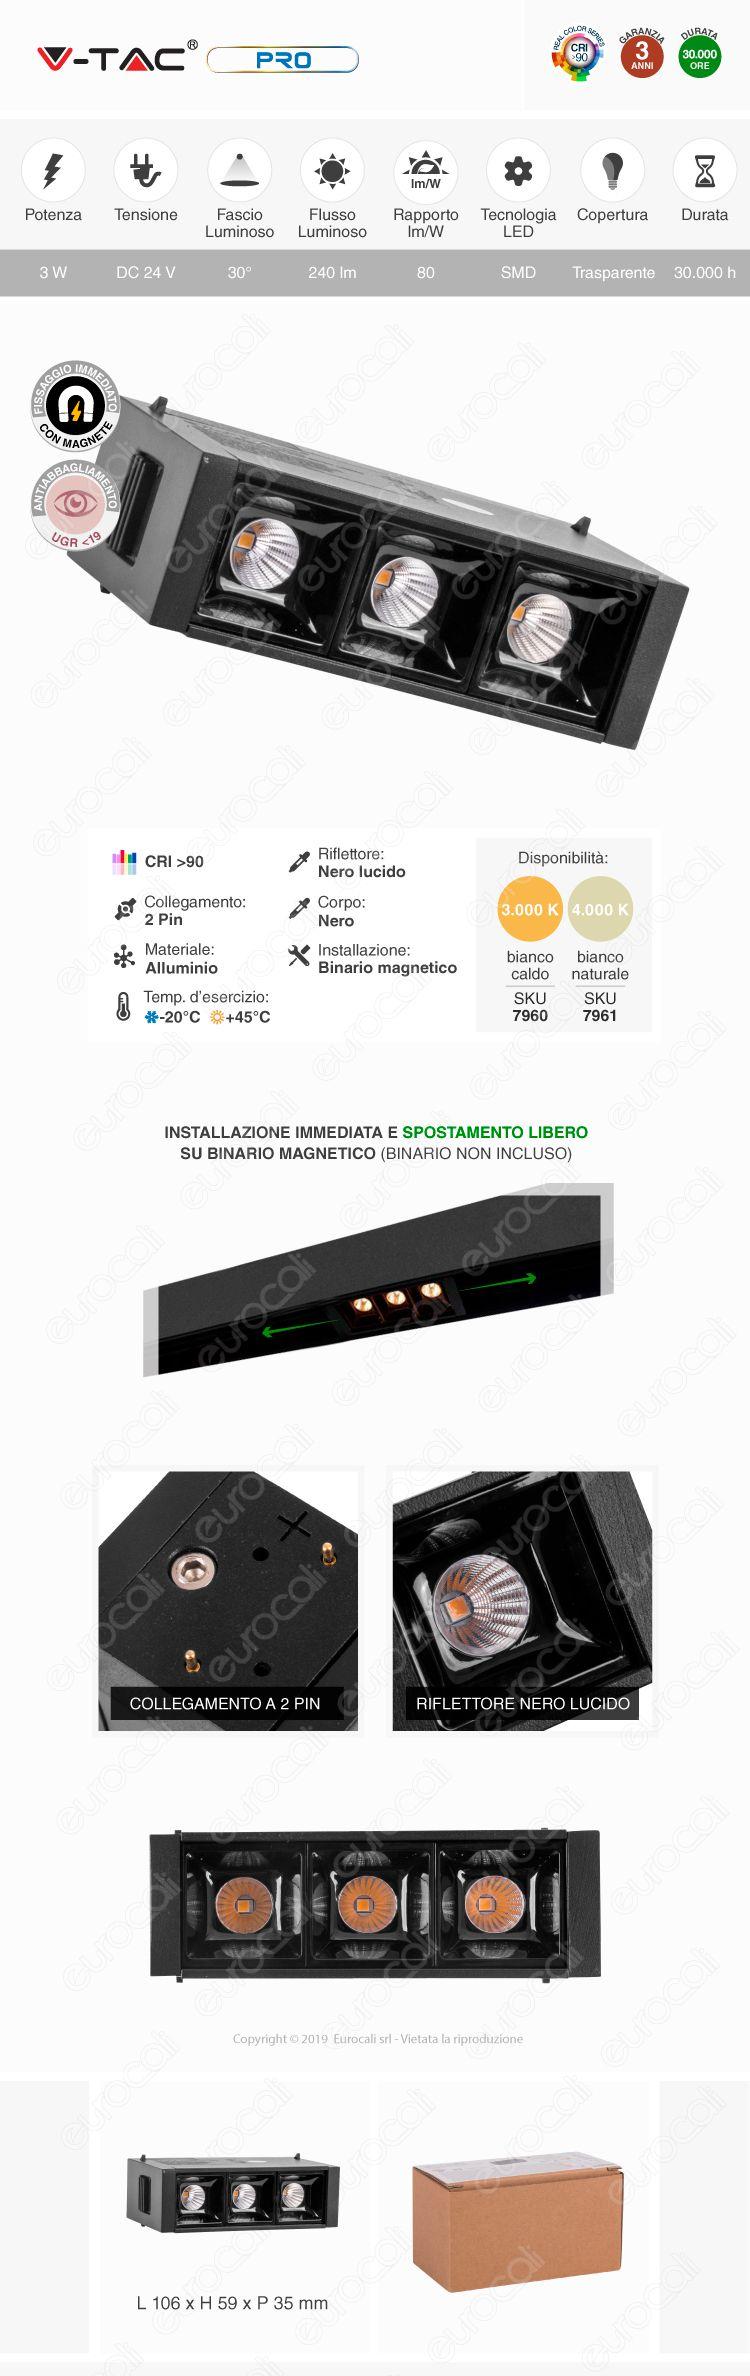 V-Tac PRO VT-4143 Magnetic Linear Spotlight